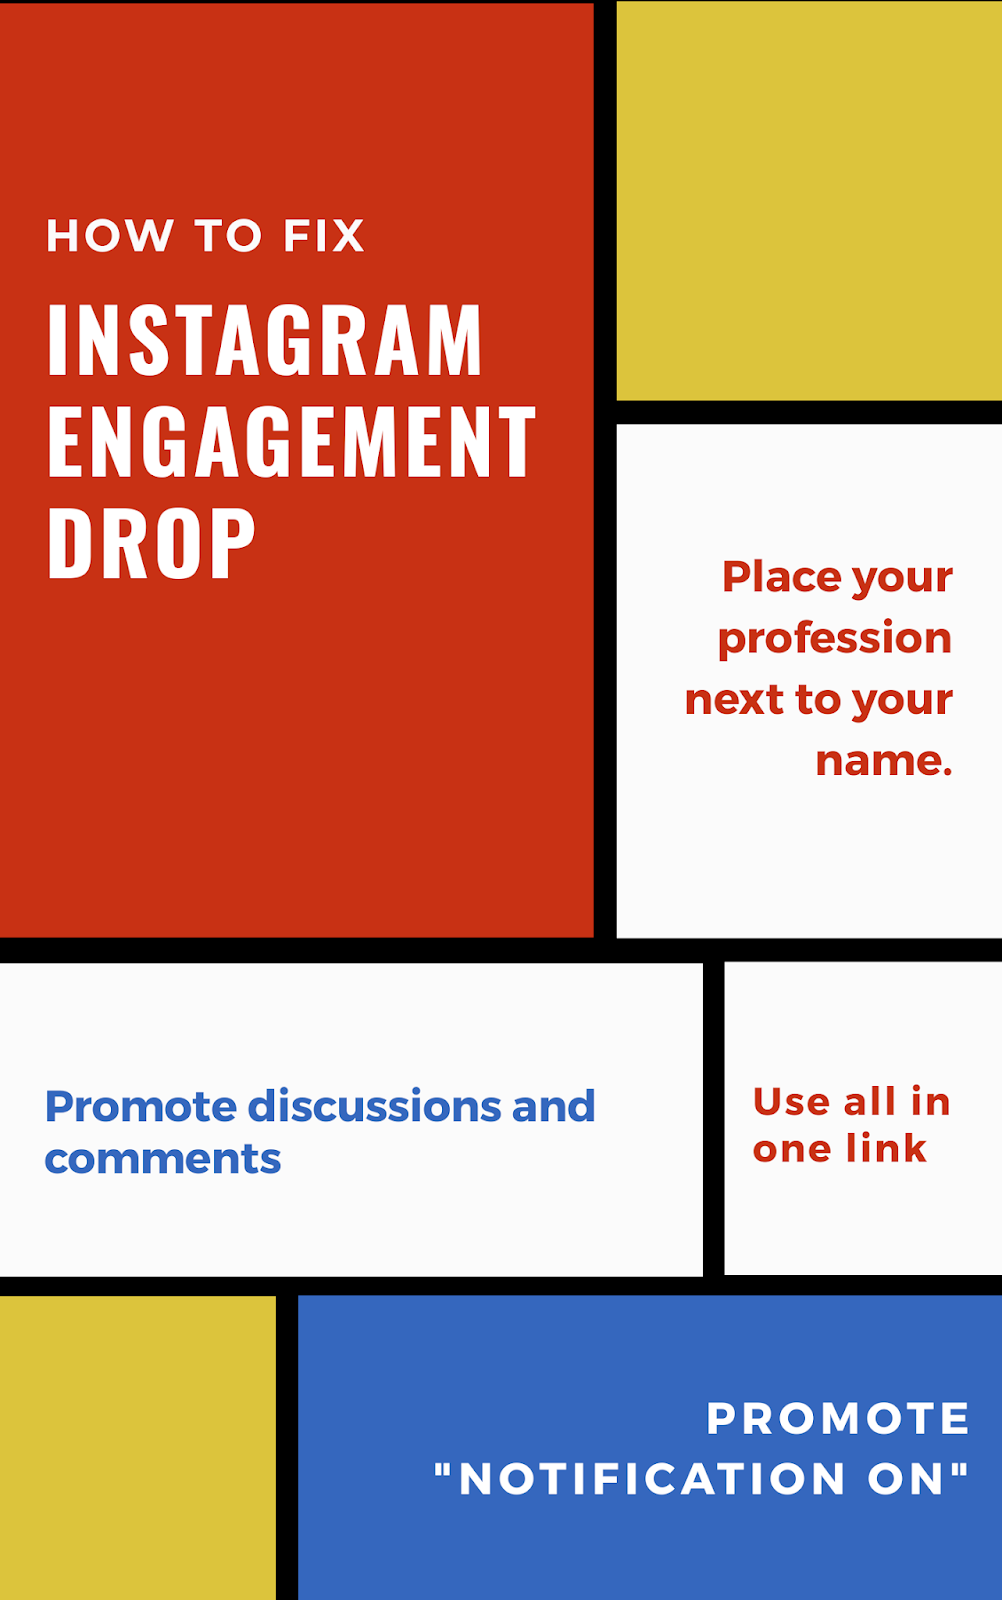 How to fix Instagram engagement drop